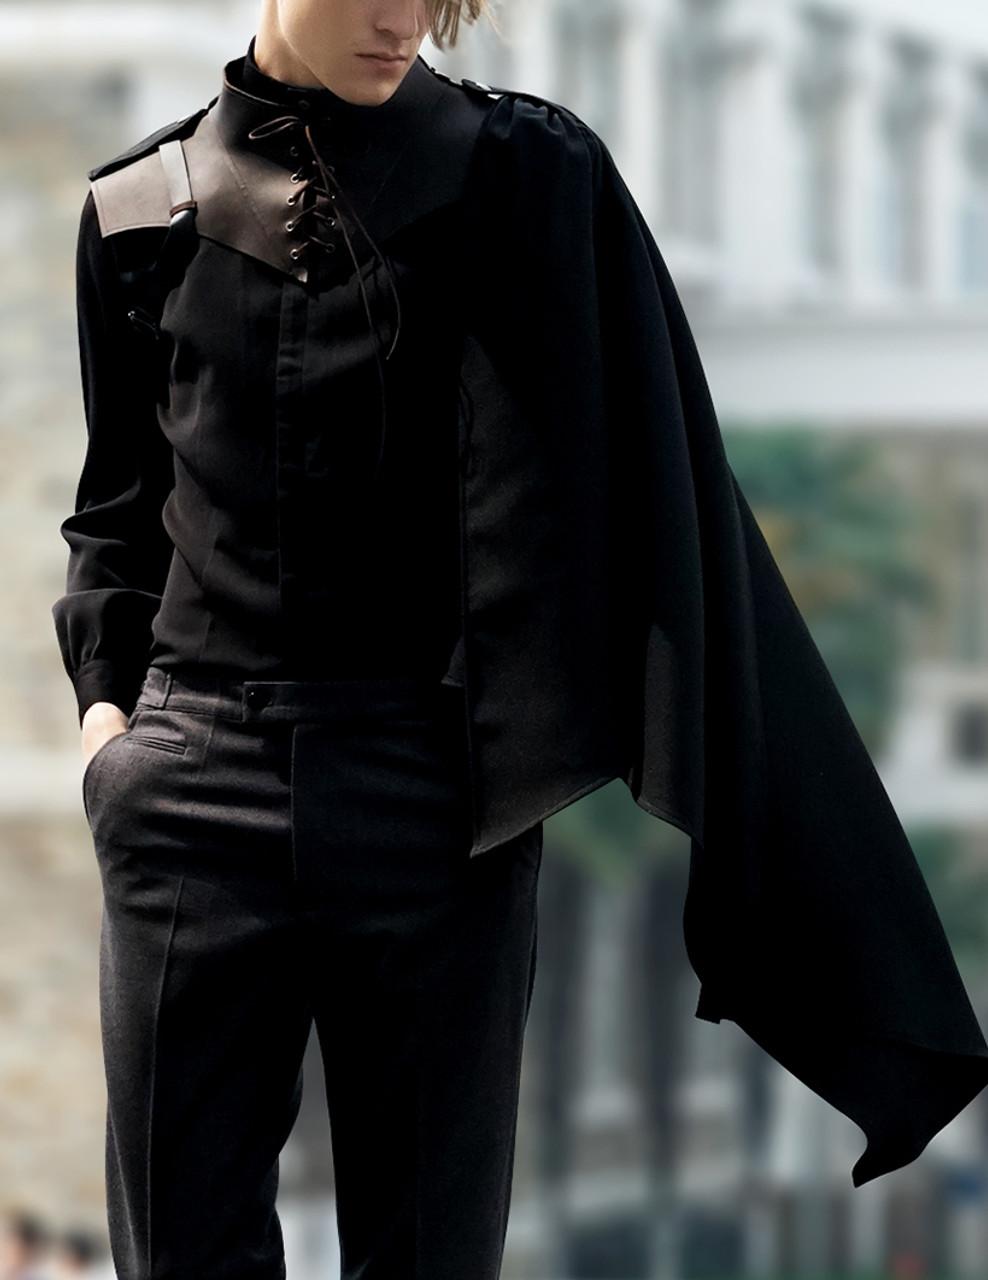 b21696b91966b Vintage Hooded Mantle Men s Black Mantle One Shoulder Retro Punk Pirate  Fashion